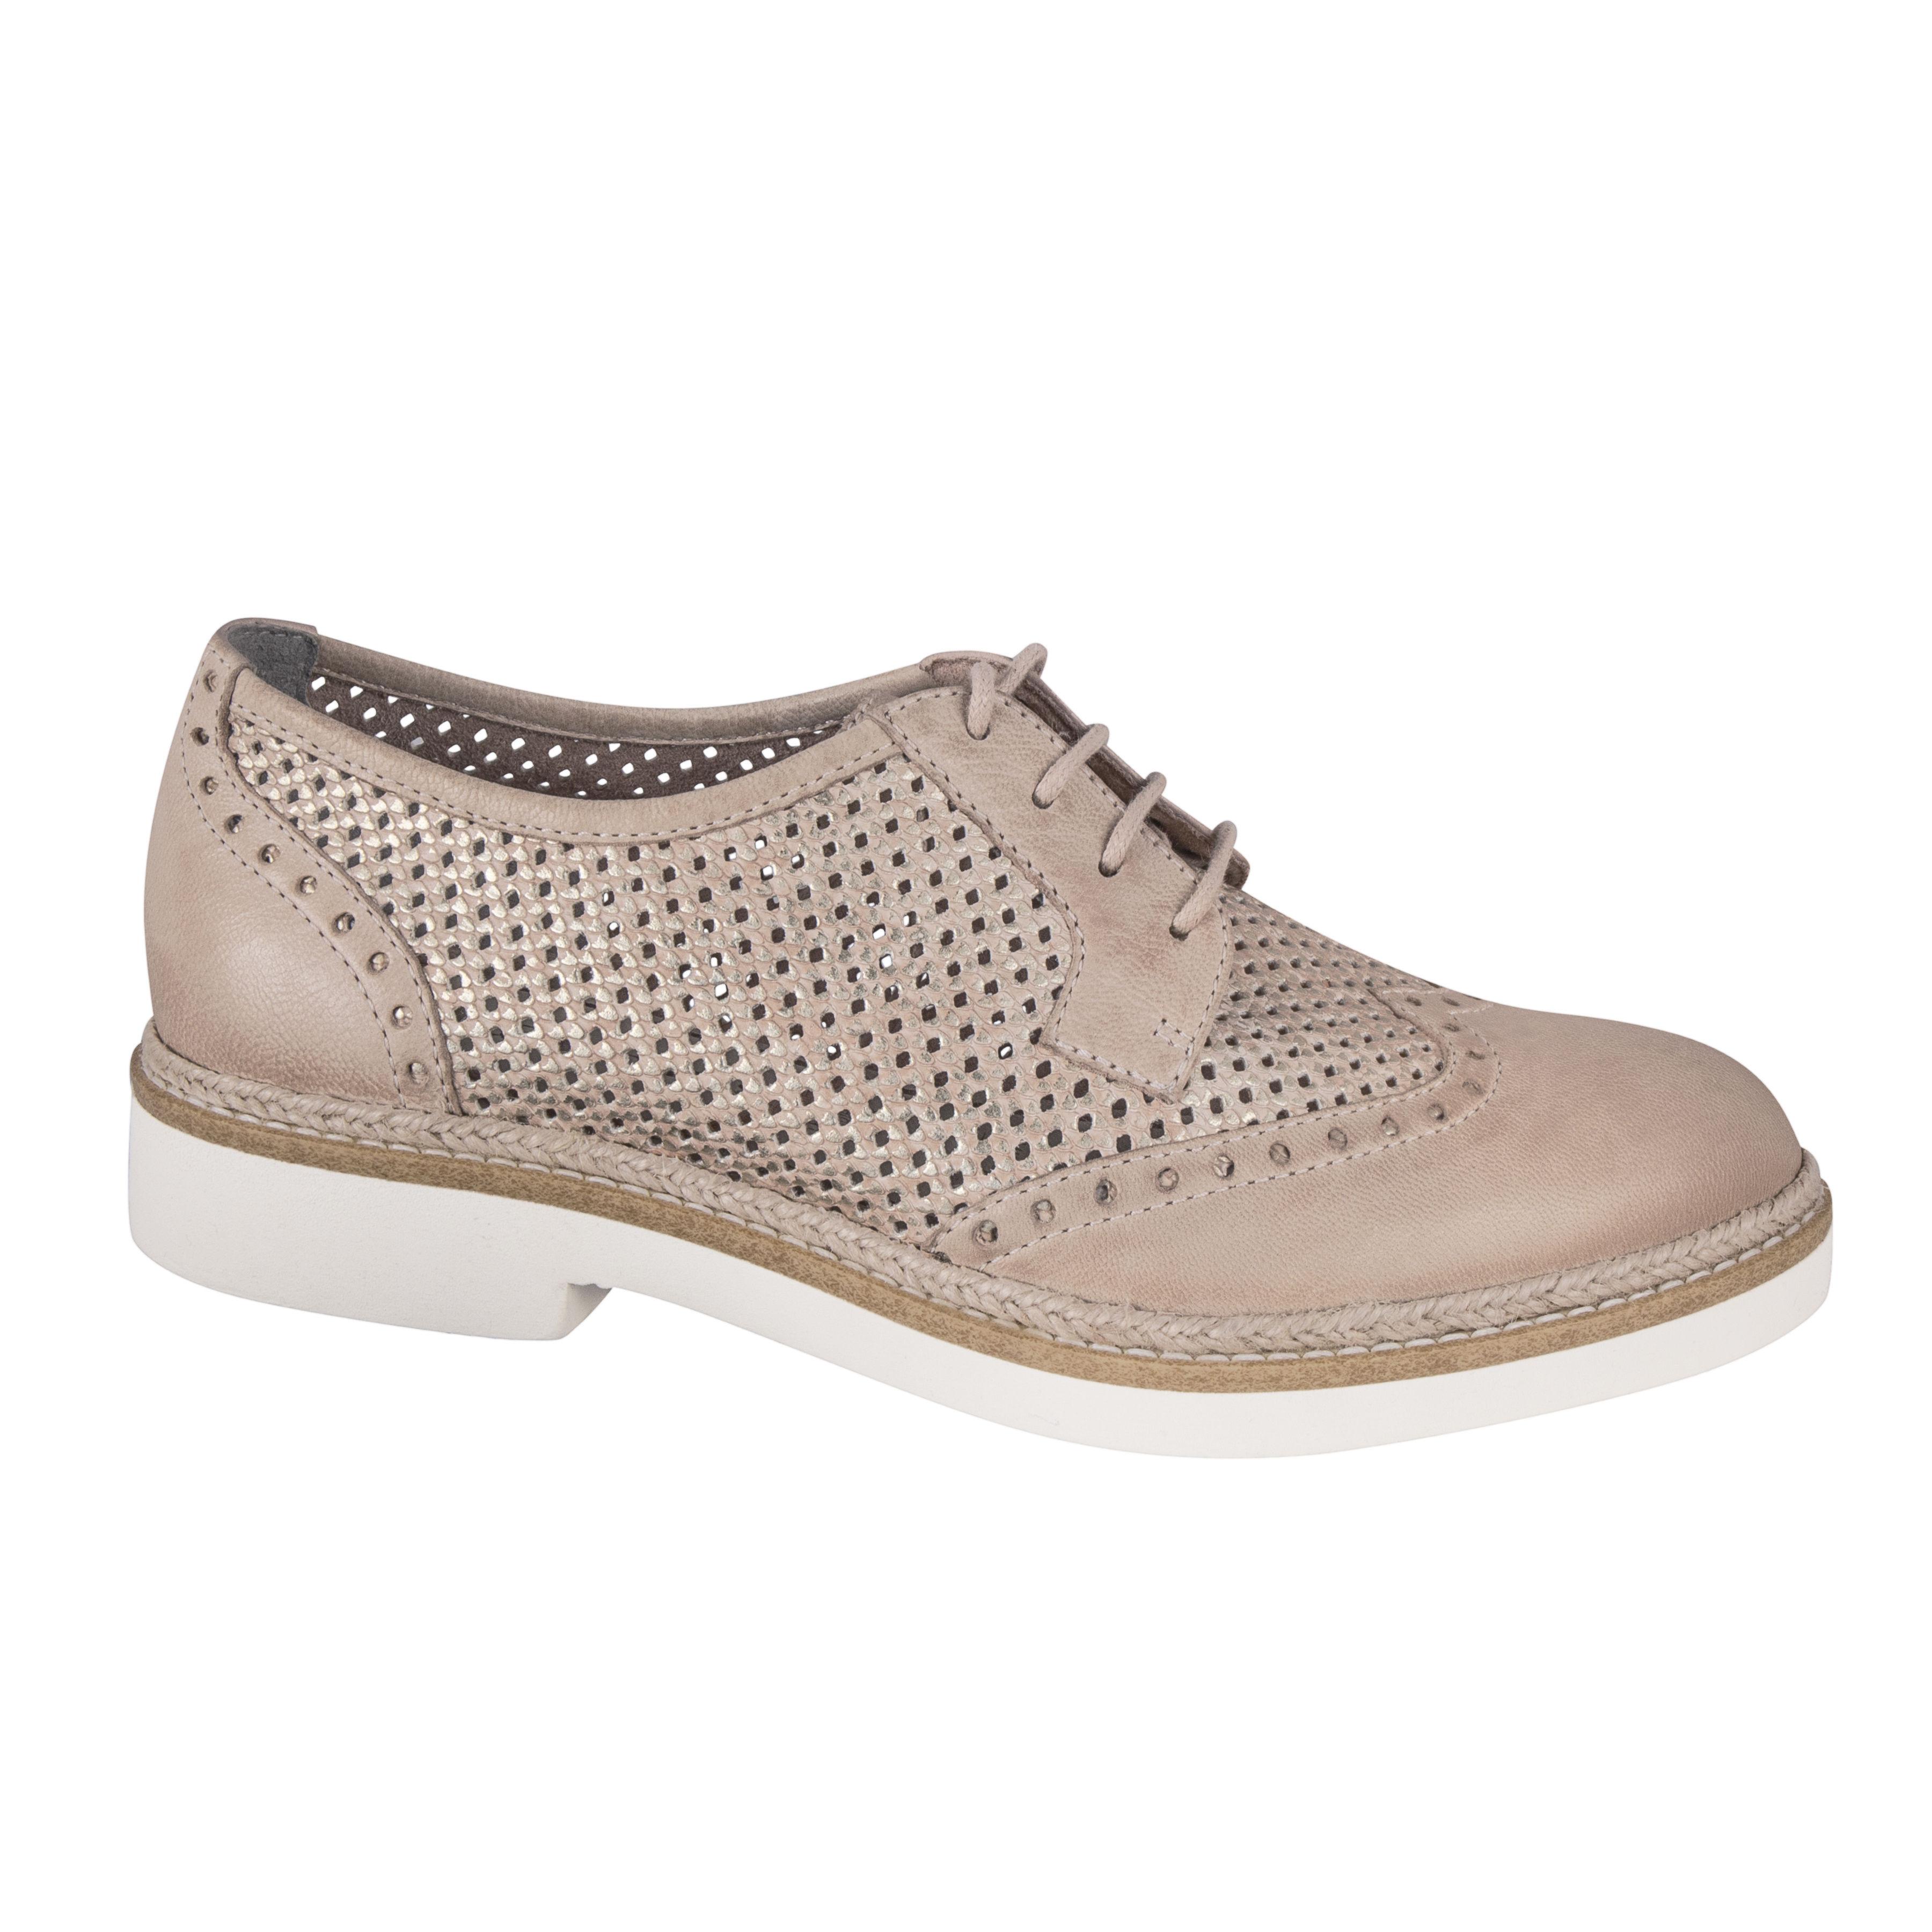 Tamaris ⋆ chaussures de marque Tamaris en ligne ⋆ Lehner